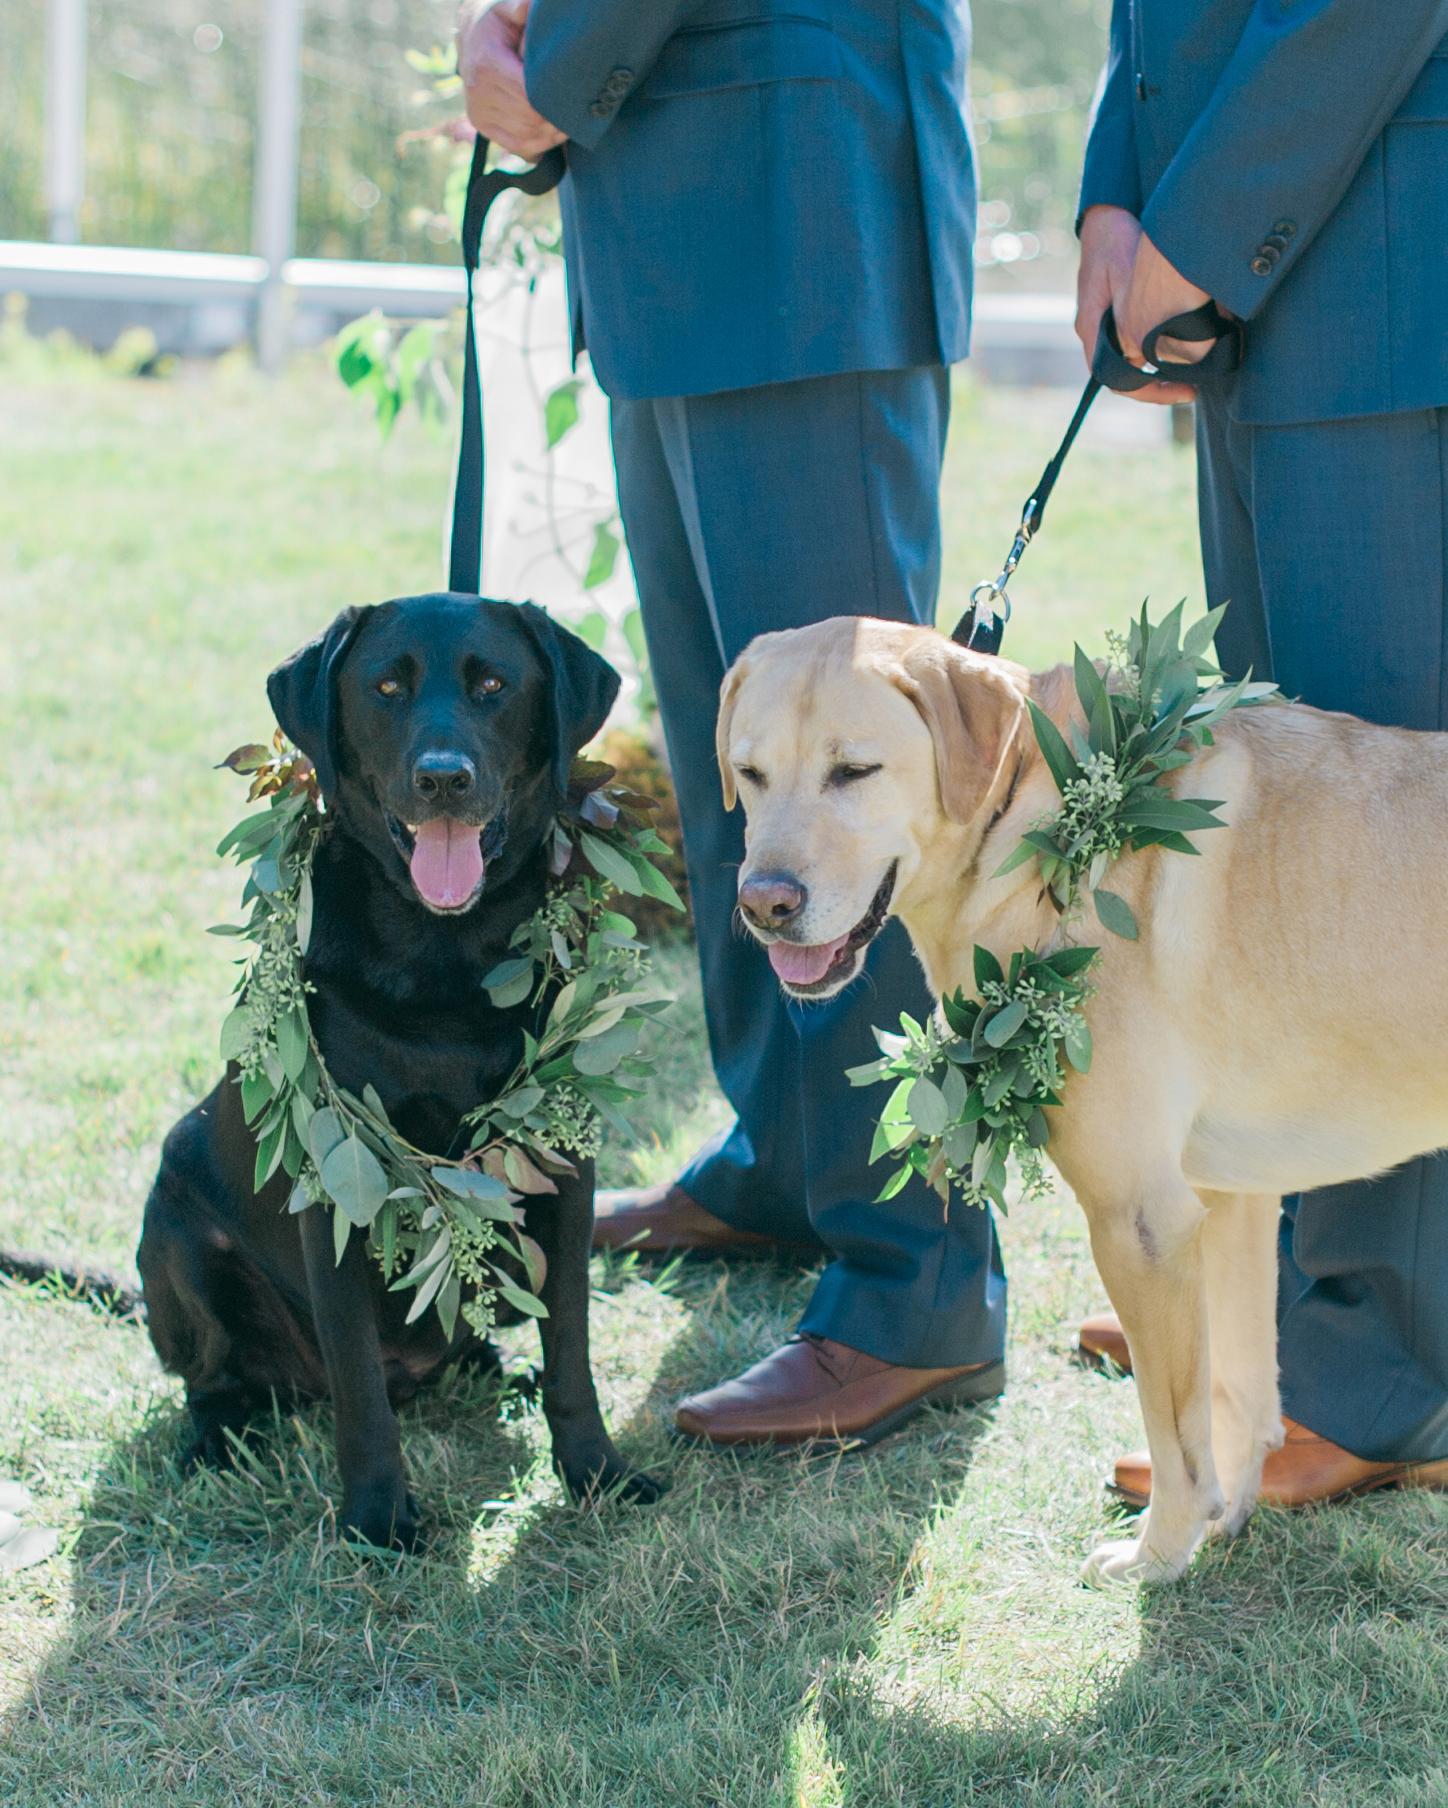 robin-kenny-wedding-dogs-114-s112068-0715.jpg